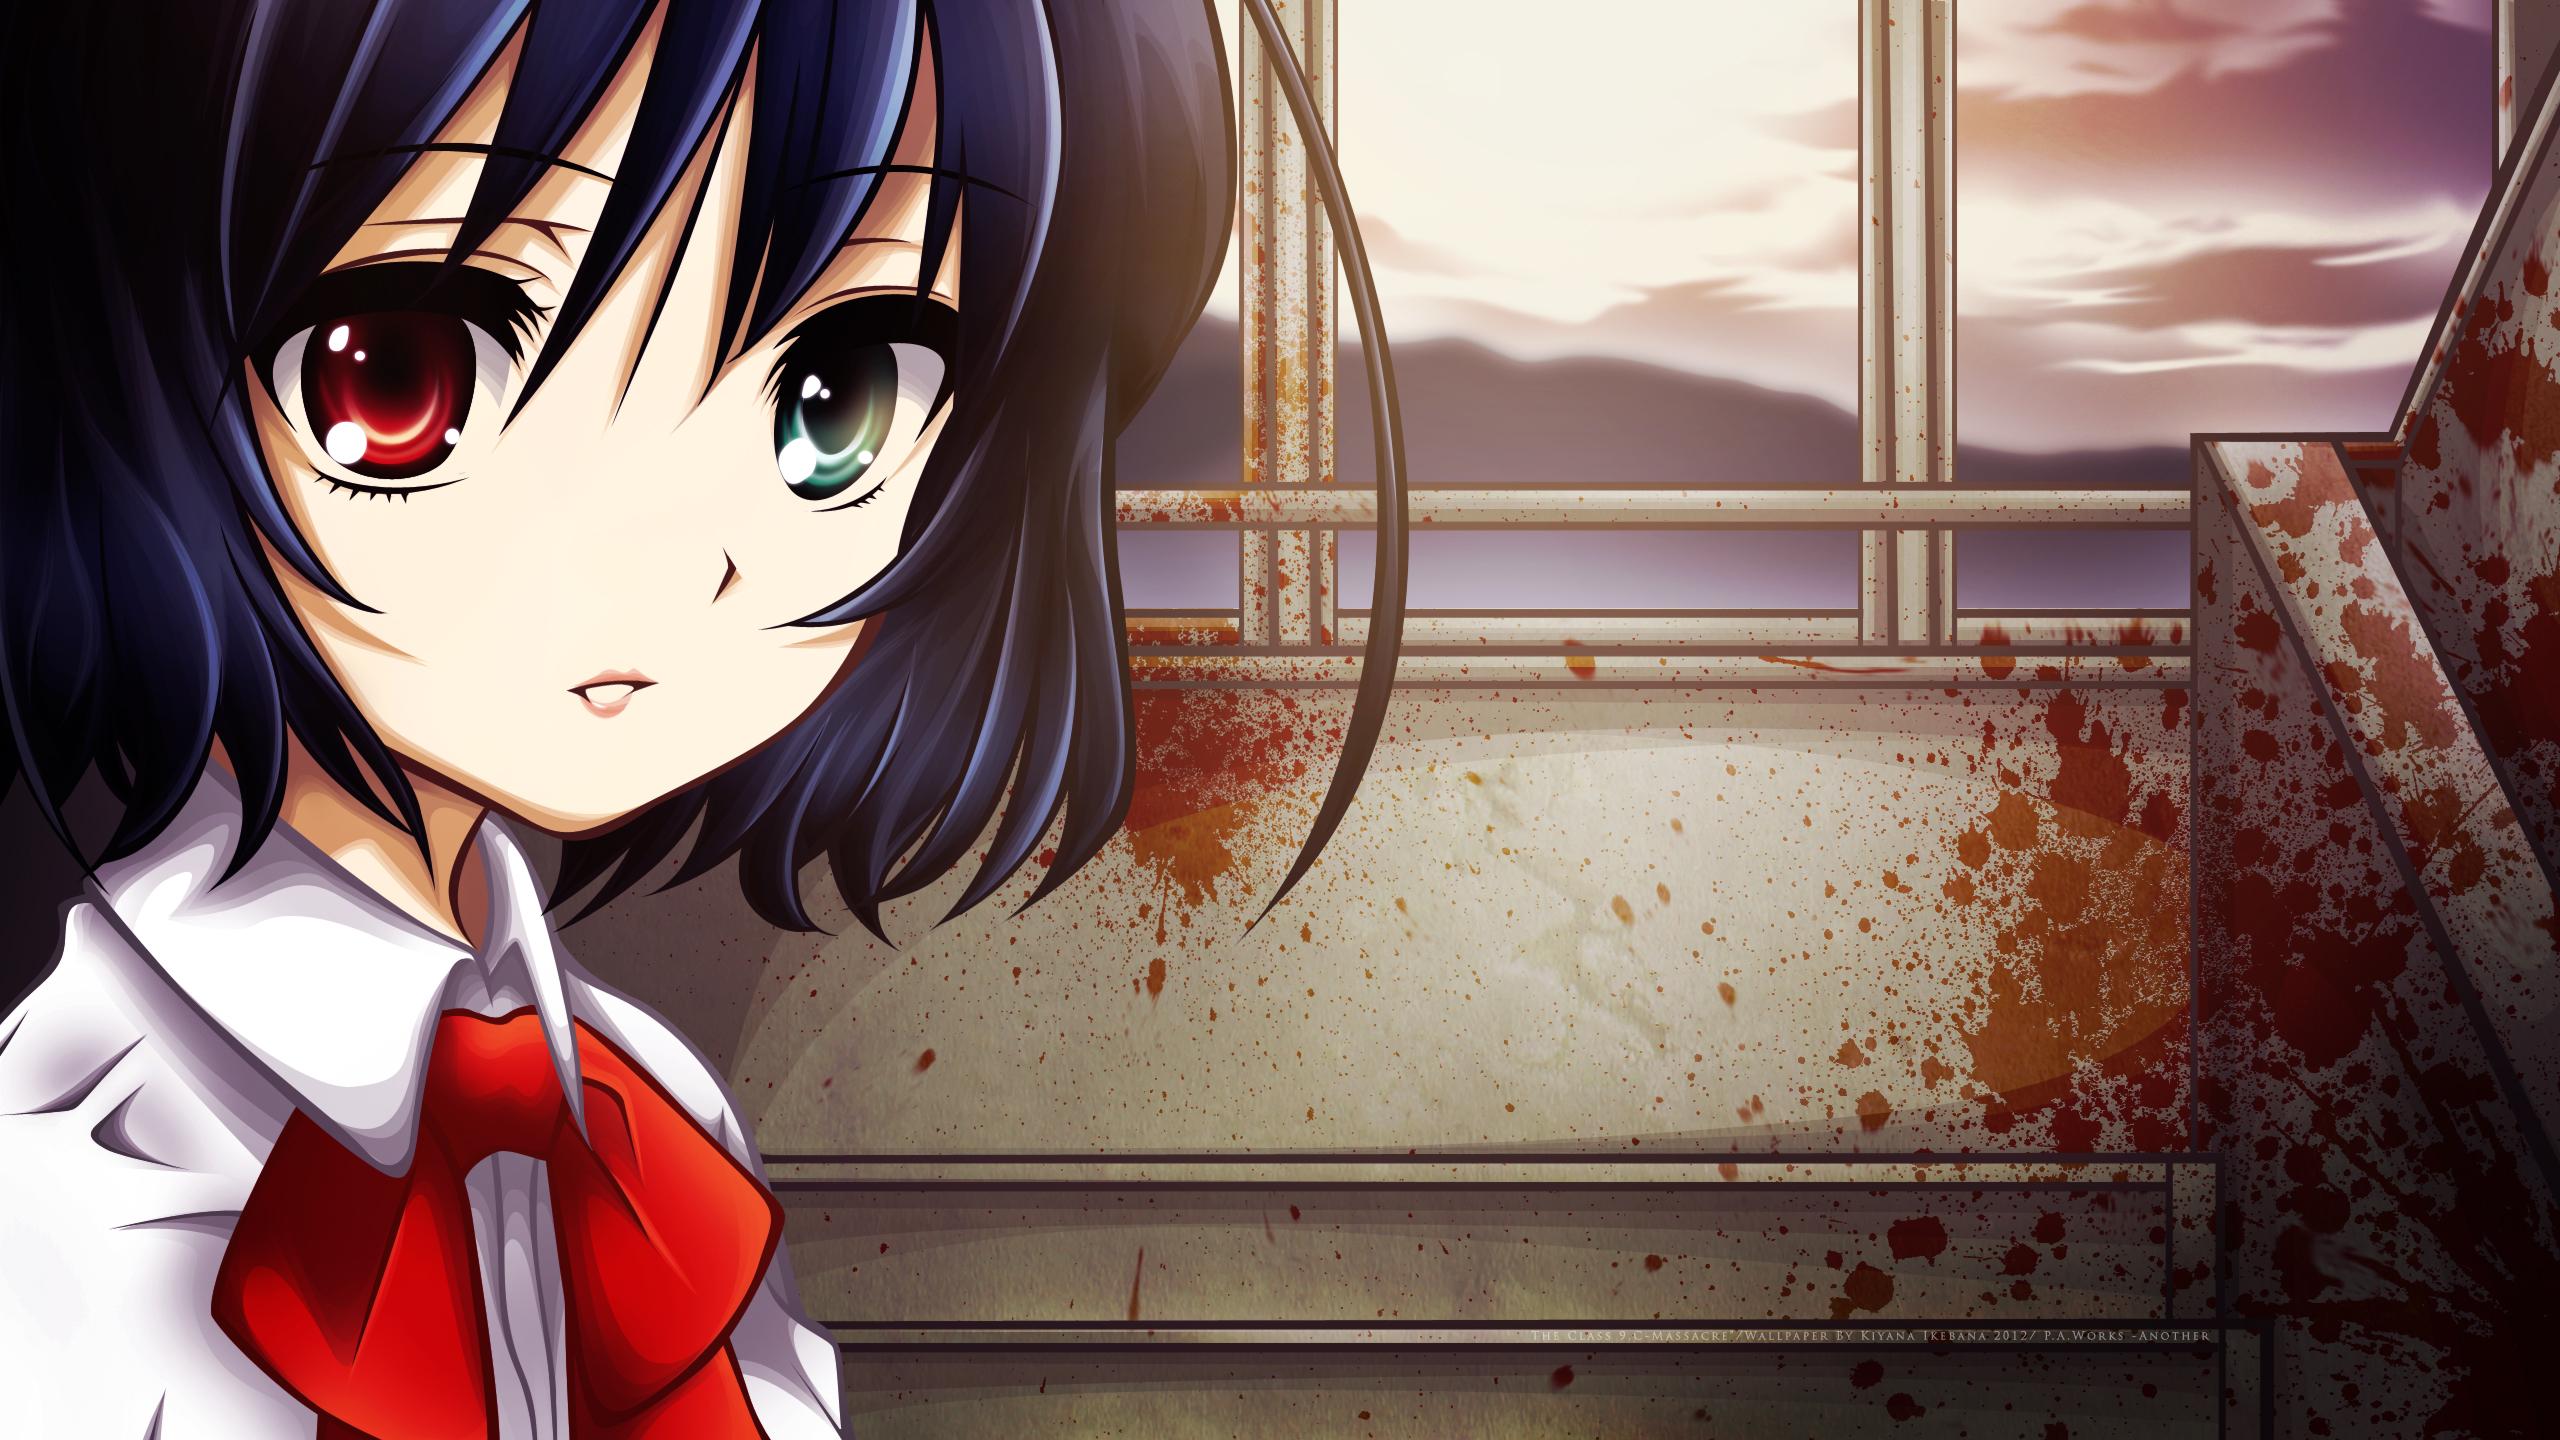 Unduh 810+ Wallpaper Hd Anime Another HD Terbaik